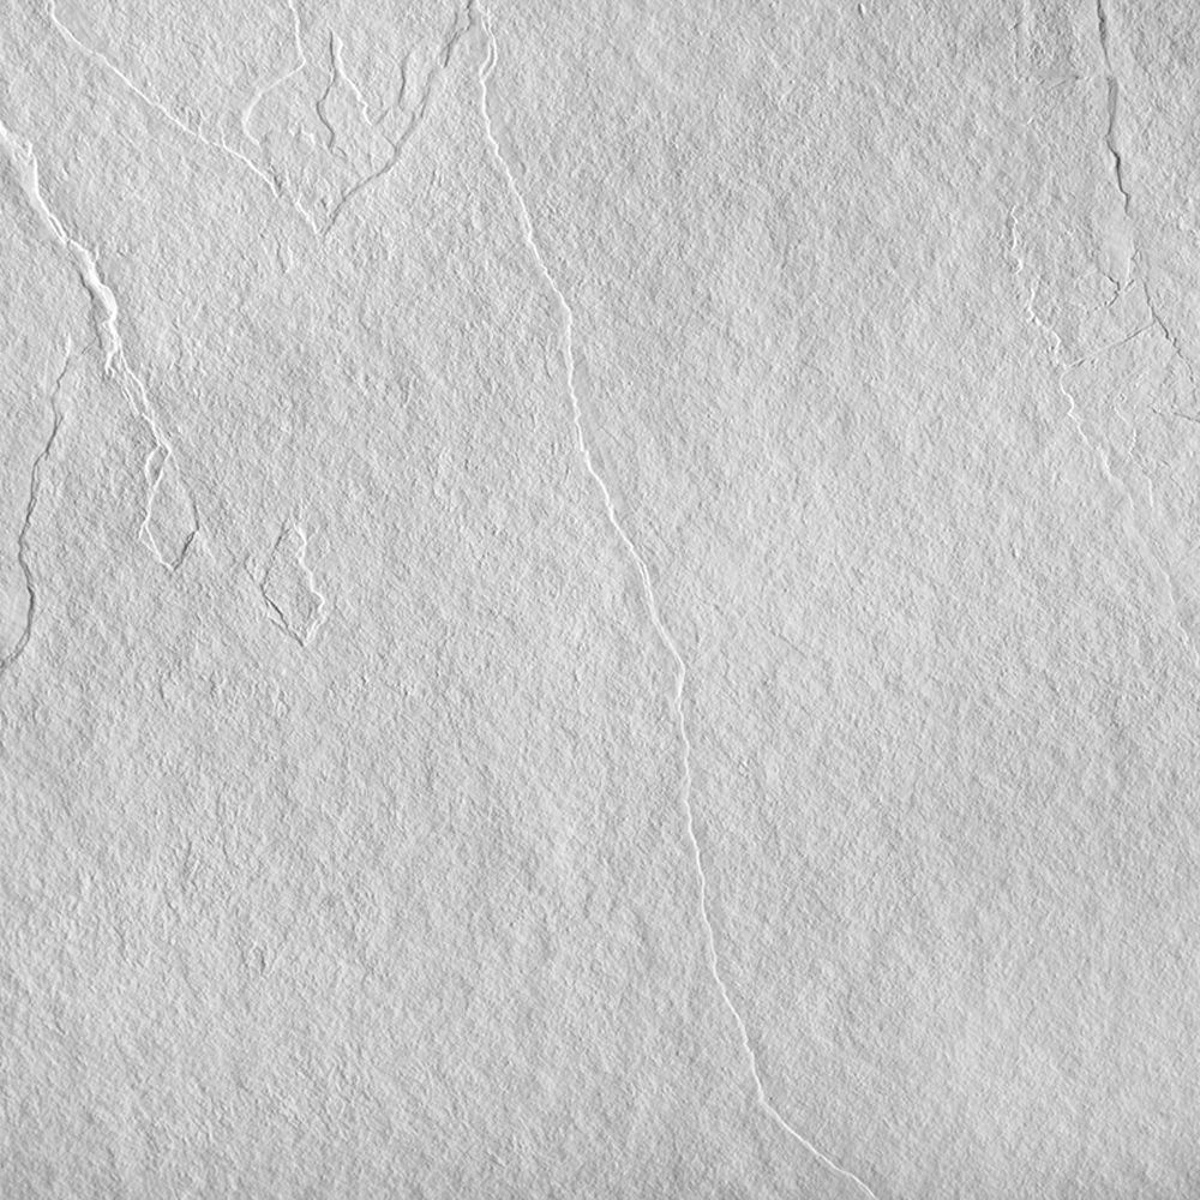 Merlyn Truestone White Quadrant Shower Tray 900 x 900mm